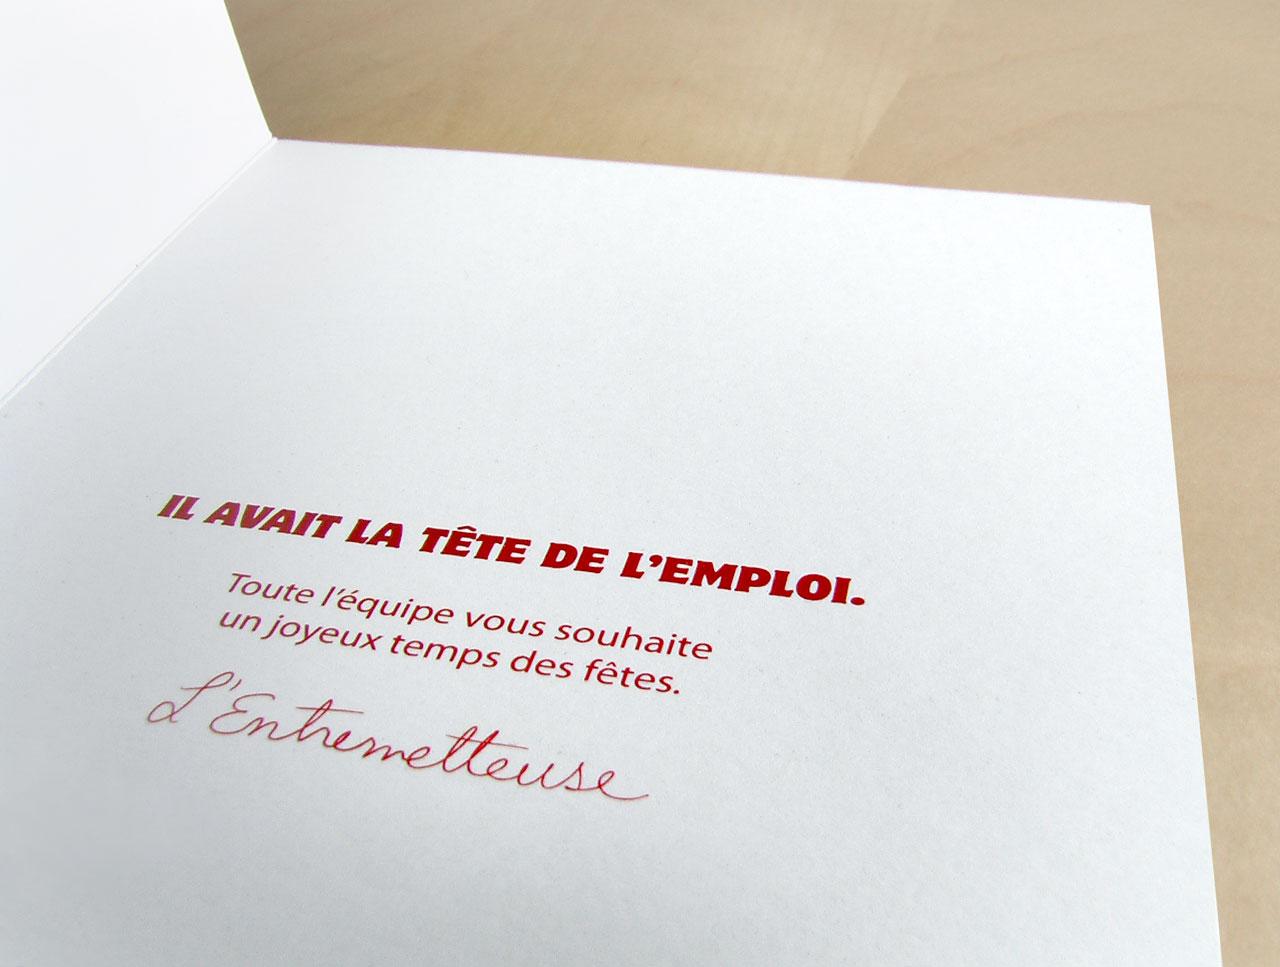 MlleRouge_LEntremetteuse_Noel_carte2